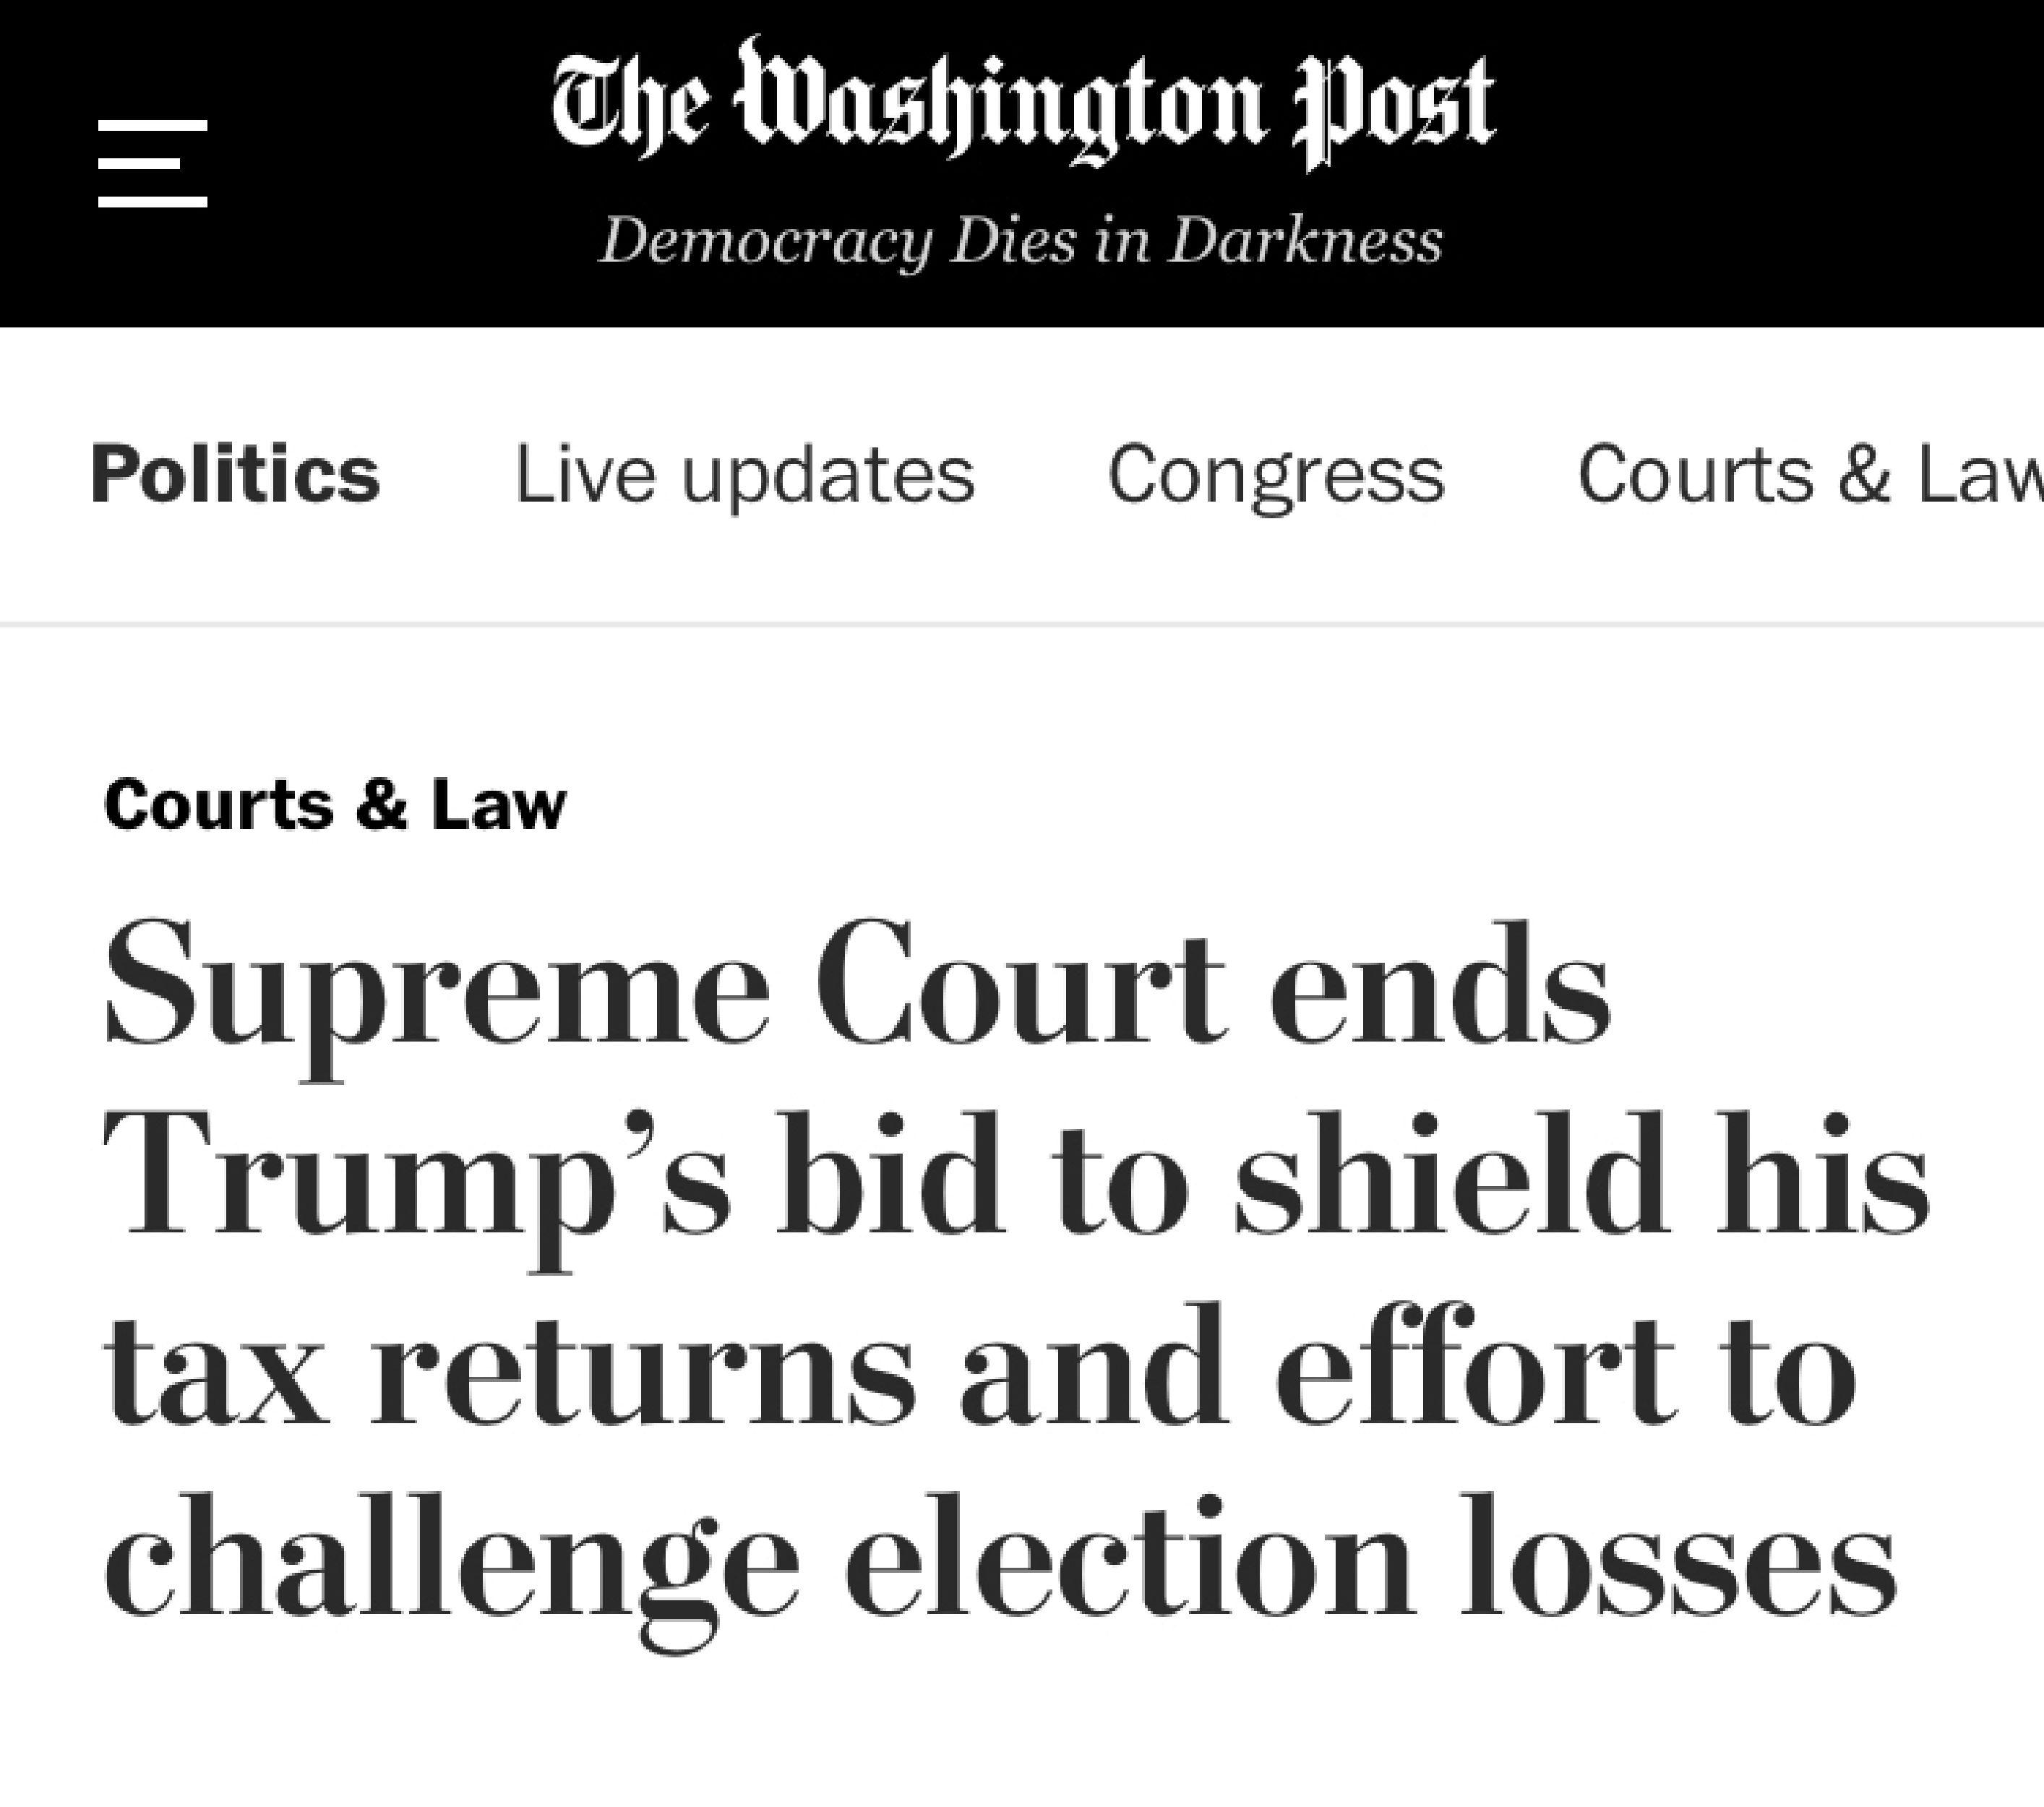 Thank you, Washington Post